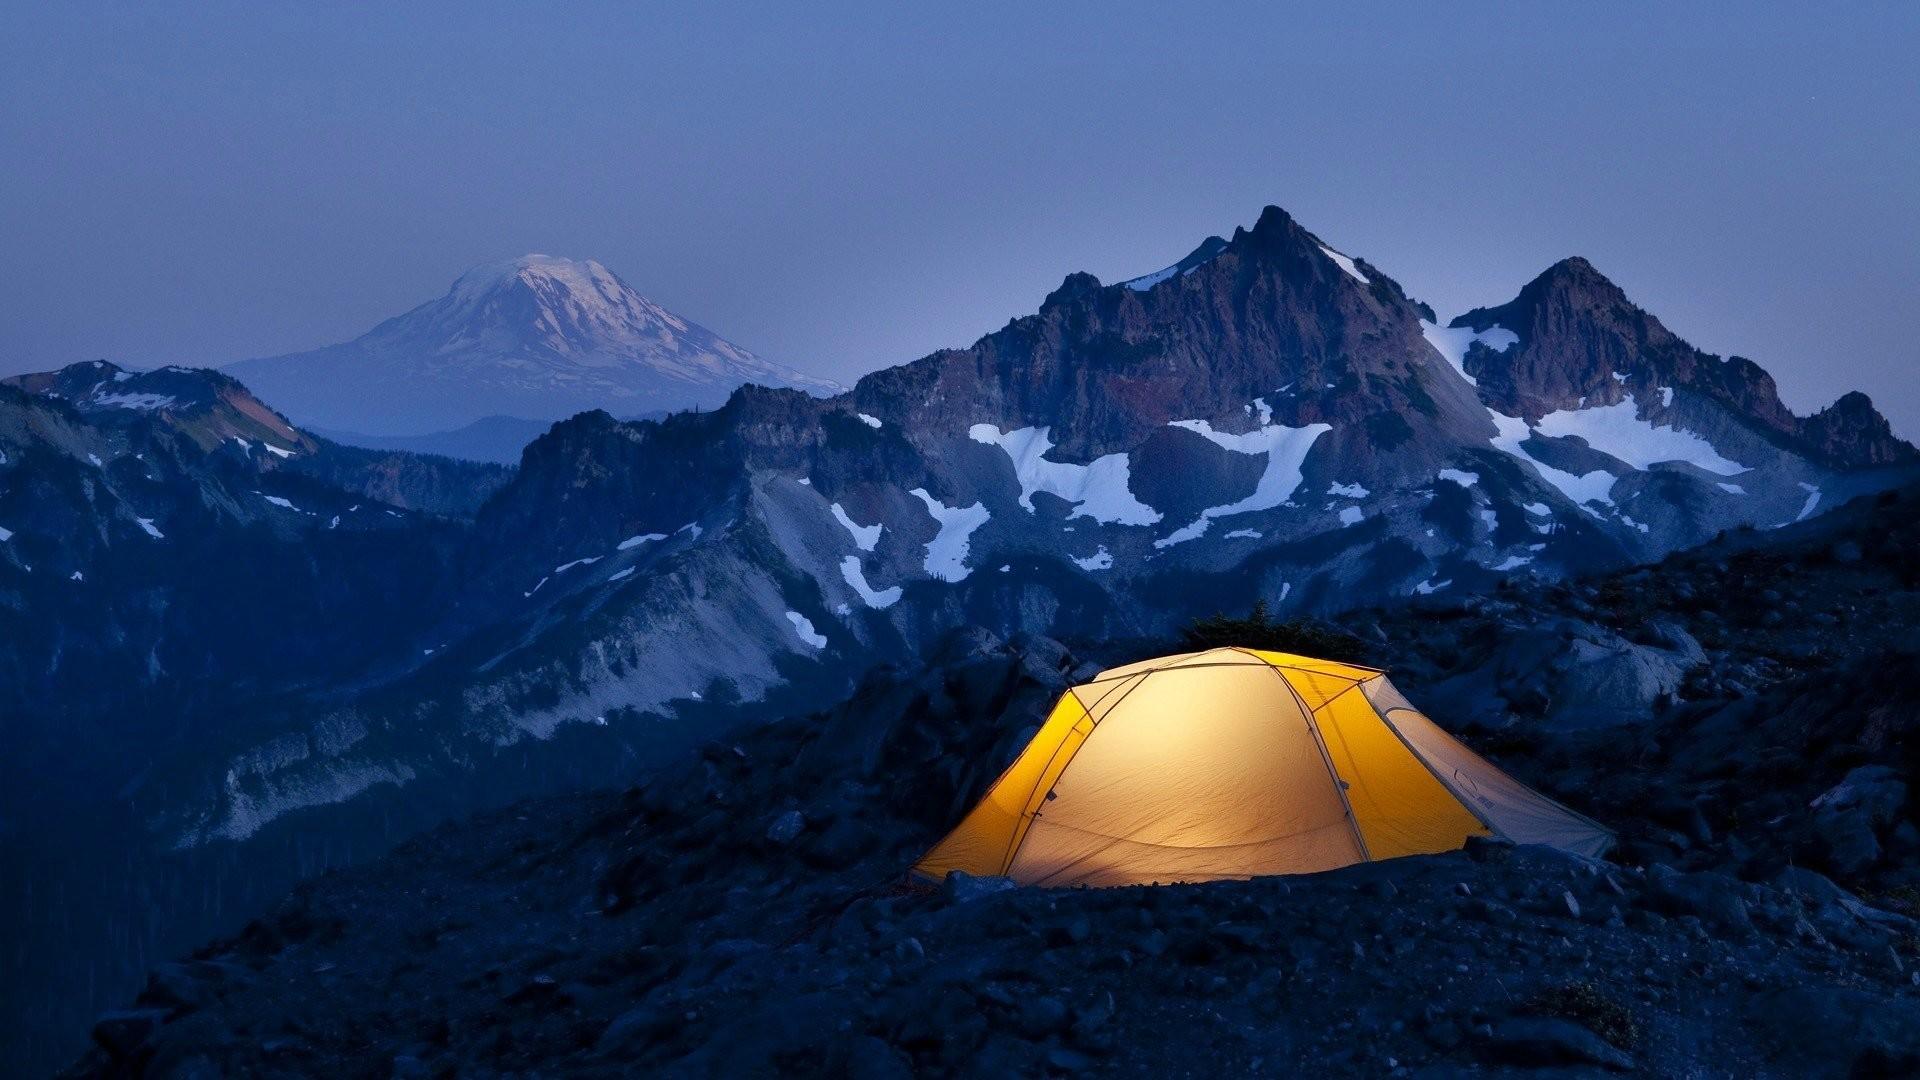 Camping Wallpaper theme